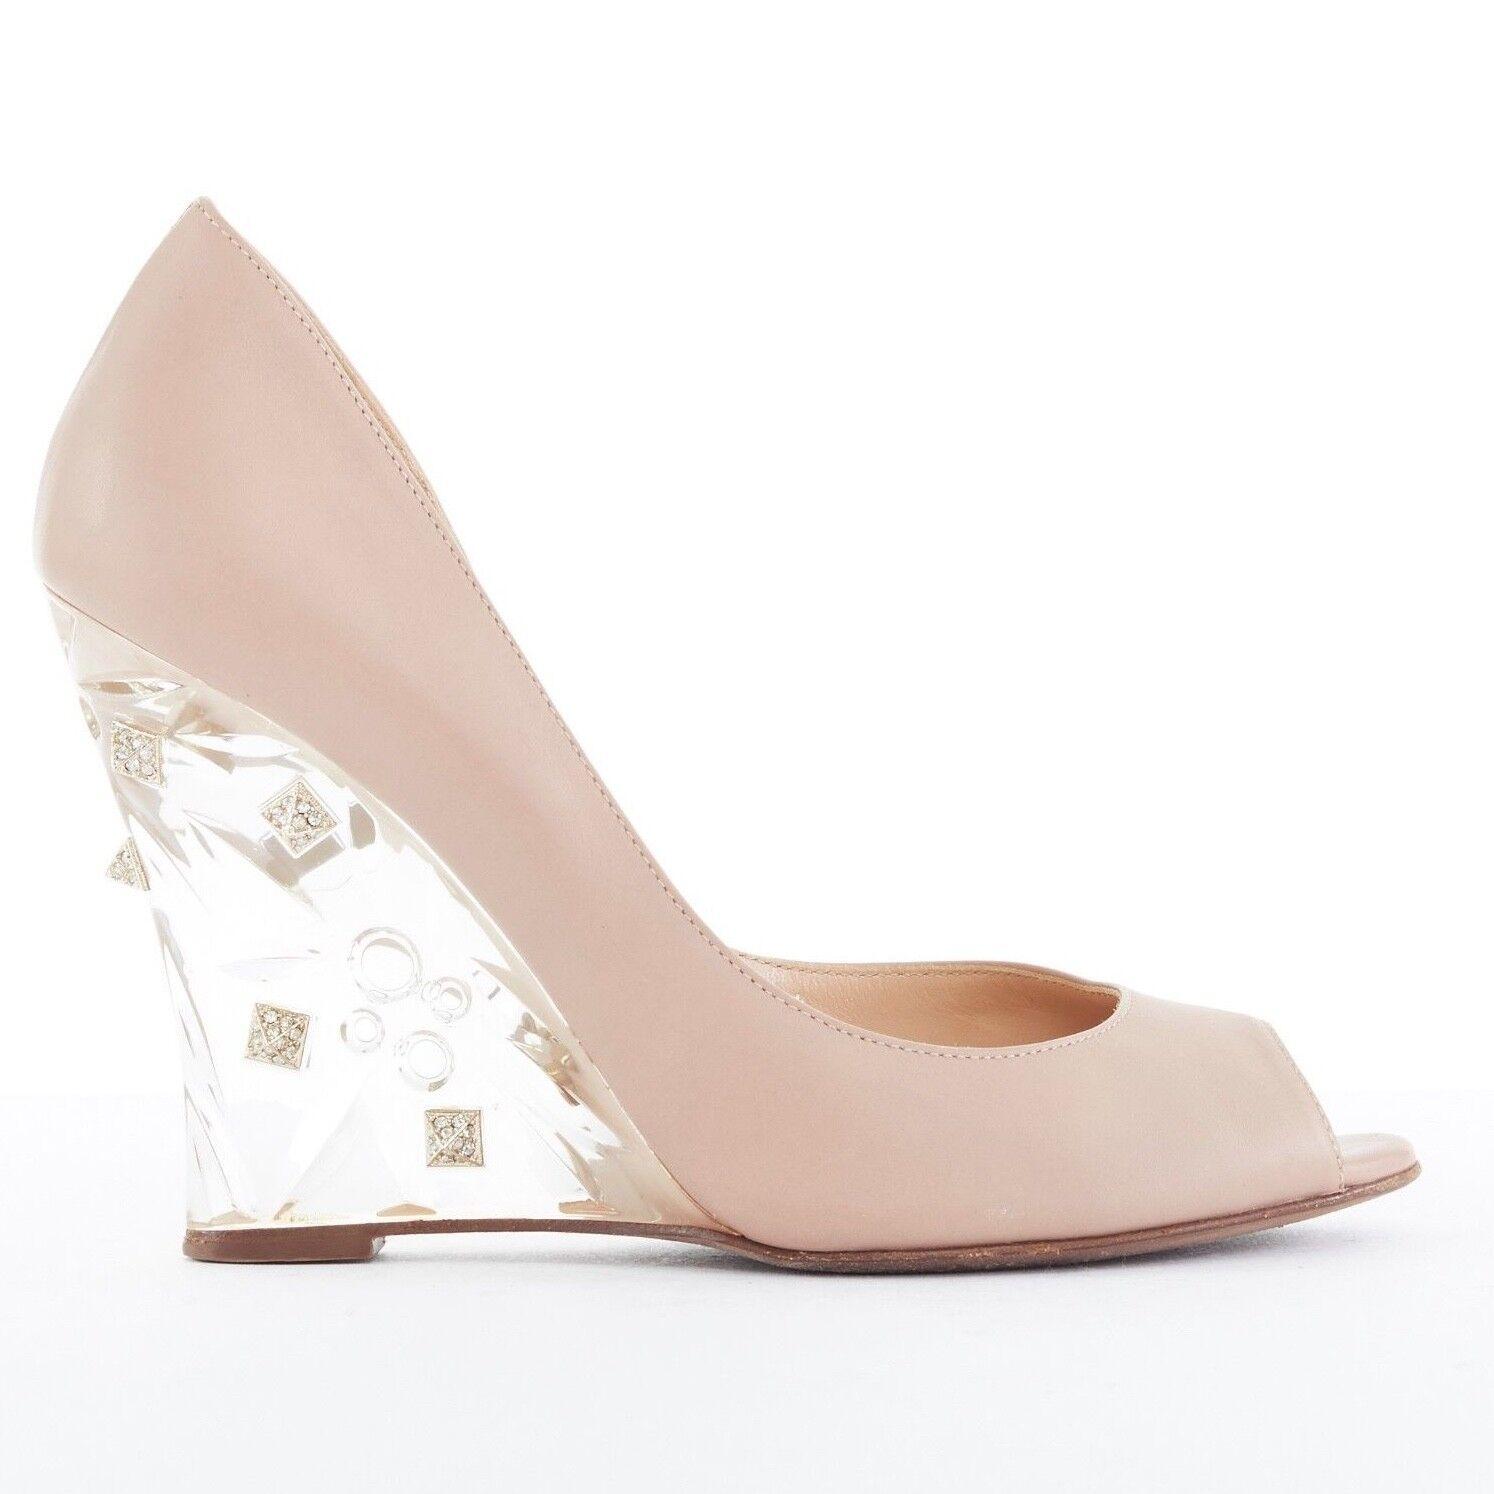 trova il tuo preferito qui VALENTINO Naked Rockstud clear crystal paved stud wedge peeptoe peeptoe peeptoe heel scarpe EU37.5  distribuzione globale